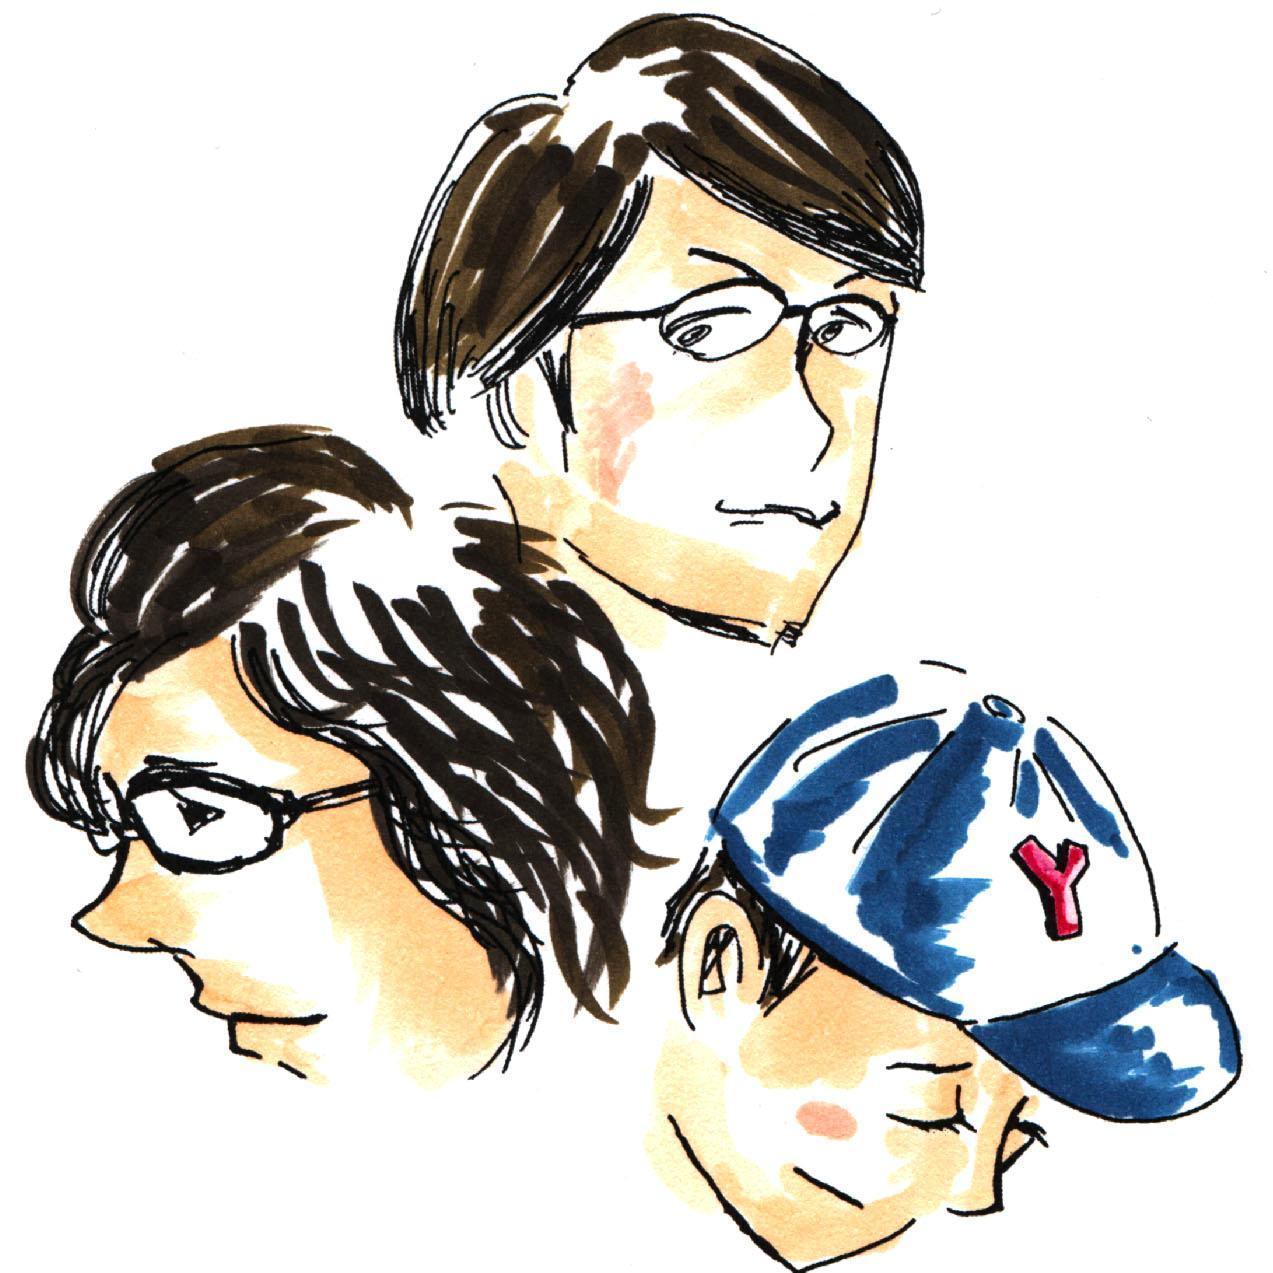 LL教室 2015年3月、チューターに憧れる非常勤講師たちが意気投合。構成作家の森野誠一、会社員のハシノイチロウ、批評家の矢野利裕の3人によって結成され、DJ、評論、イベントなどを通じて音楽を提示するユニット。